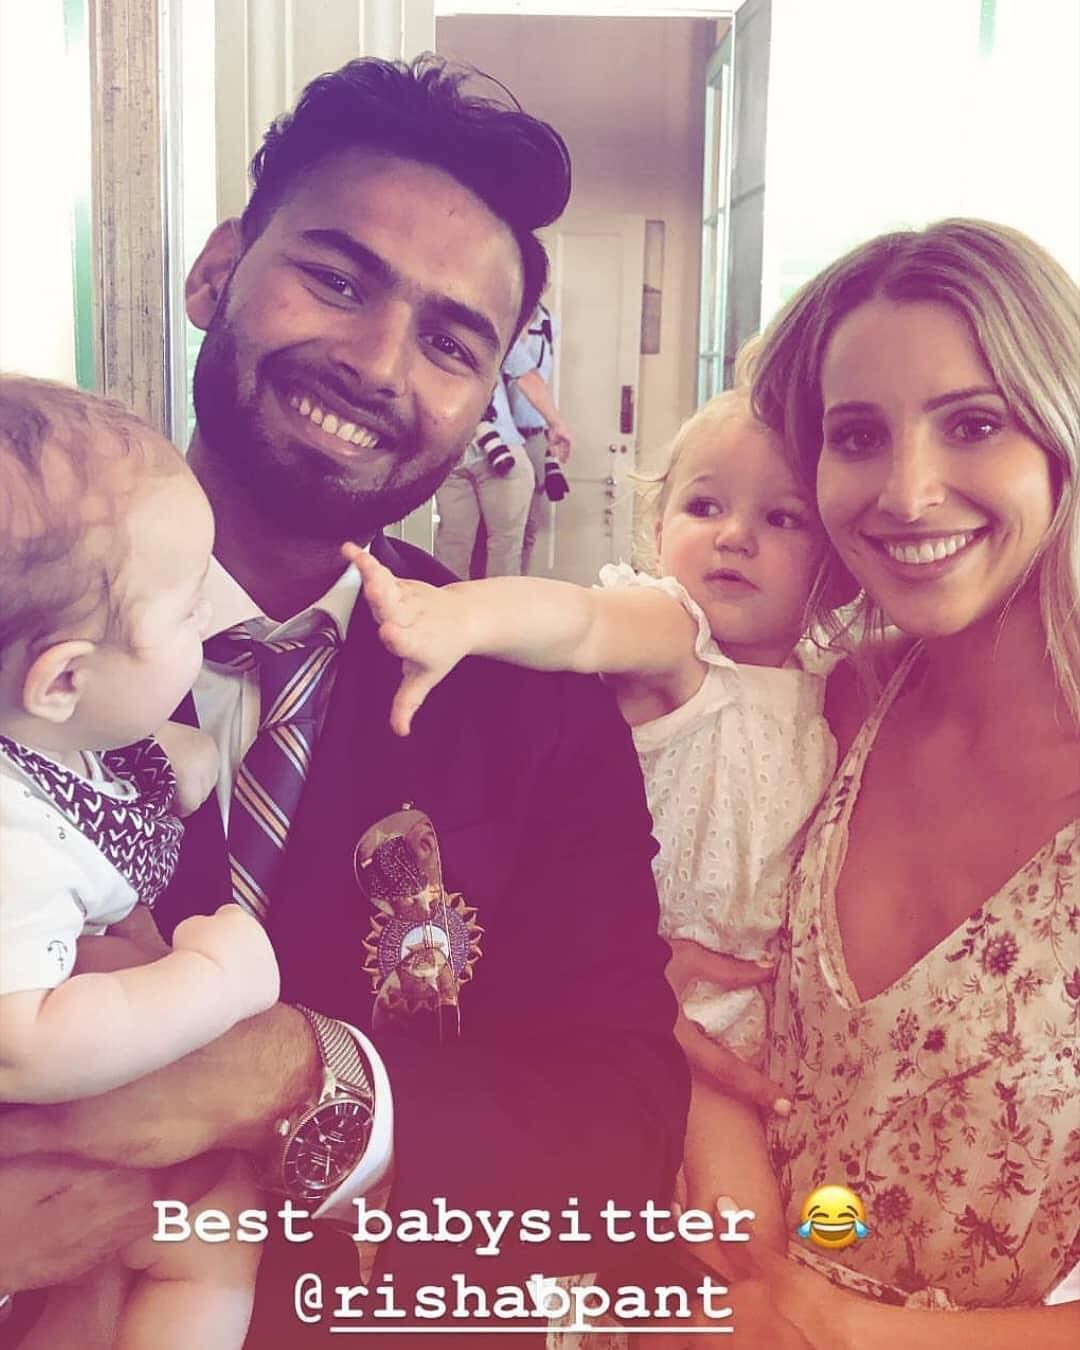 Haha Rishab Pant Babysitting Tim Paine S Kids Today At Kirribillihouse Lovecricket Rishabpant Ricky Ponting Babysitter India Cricket Team